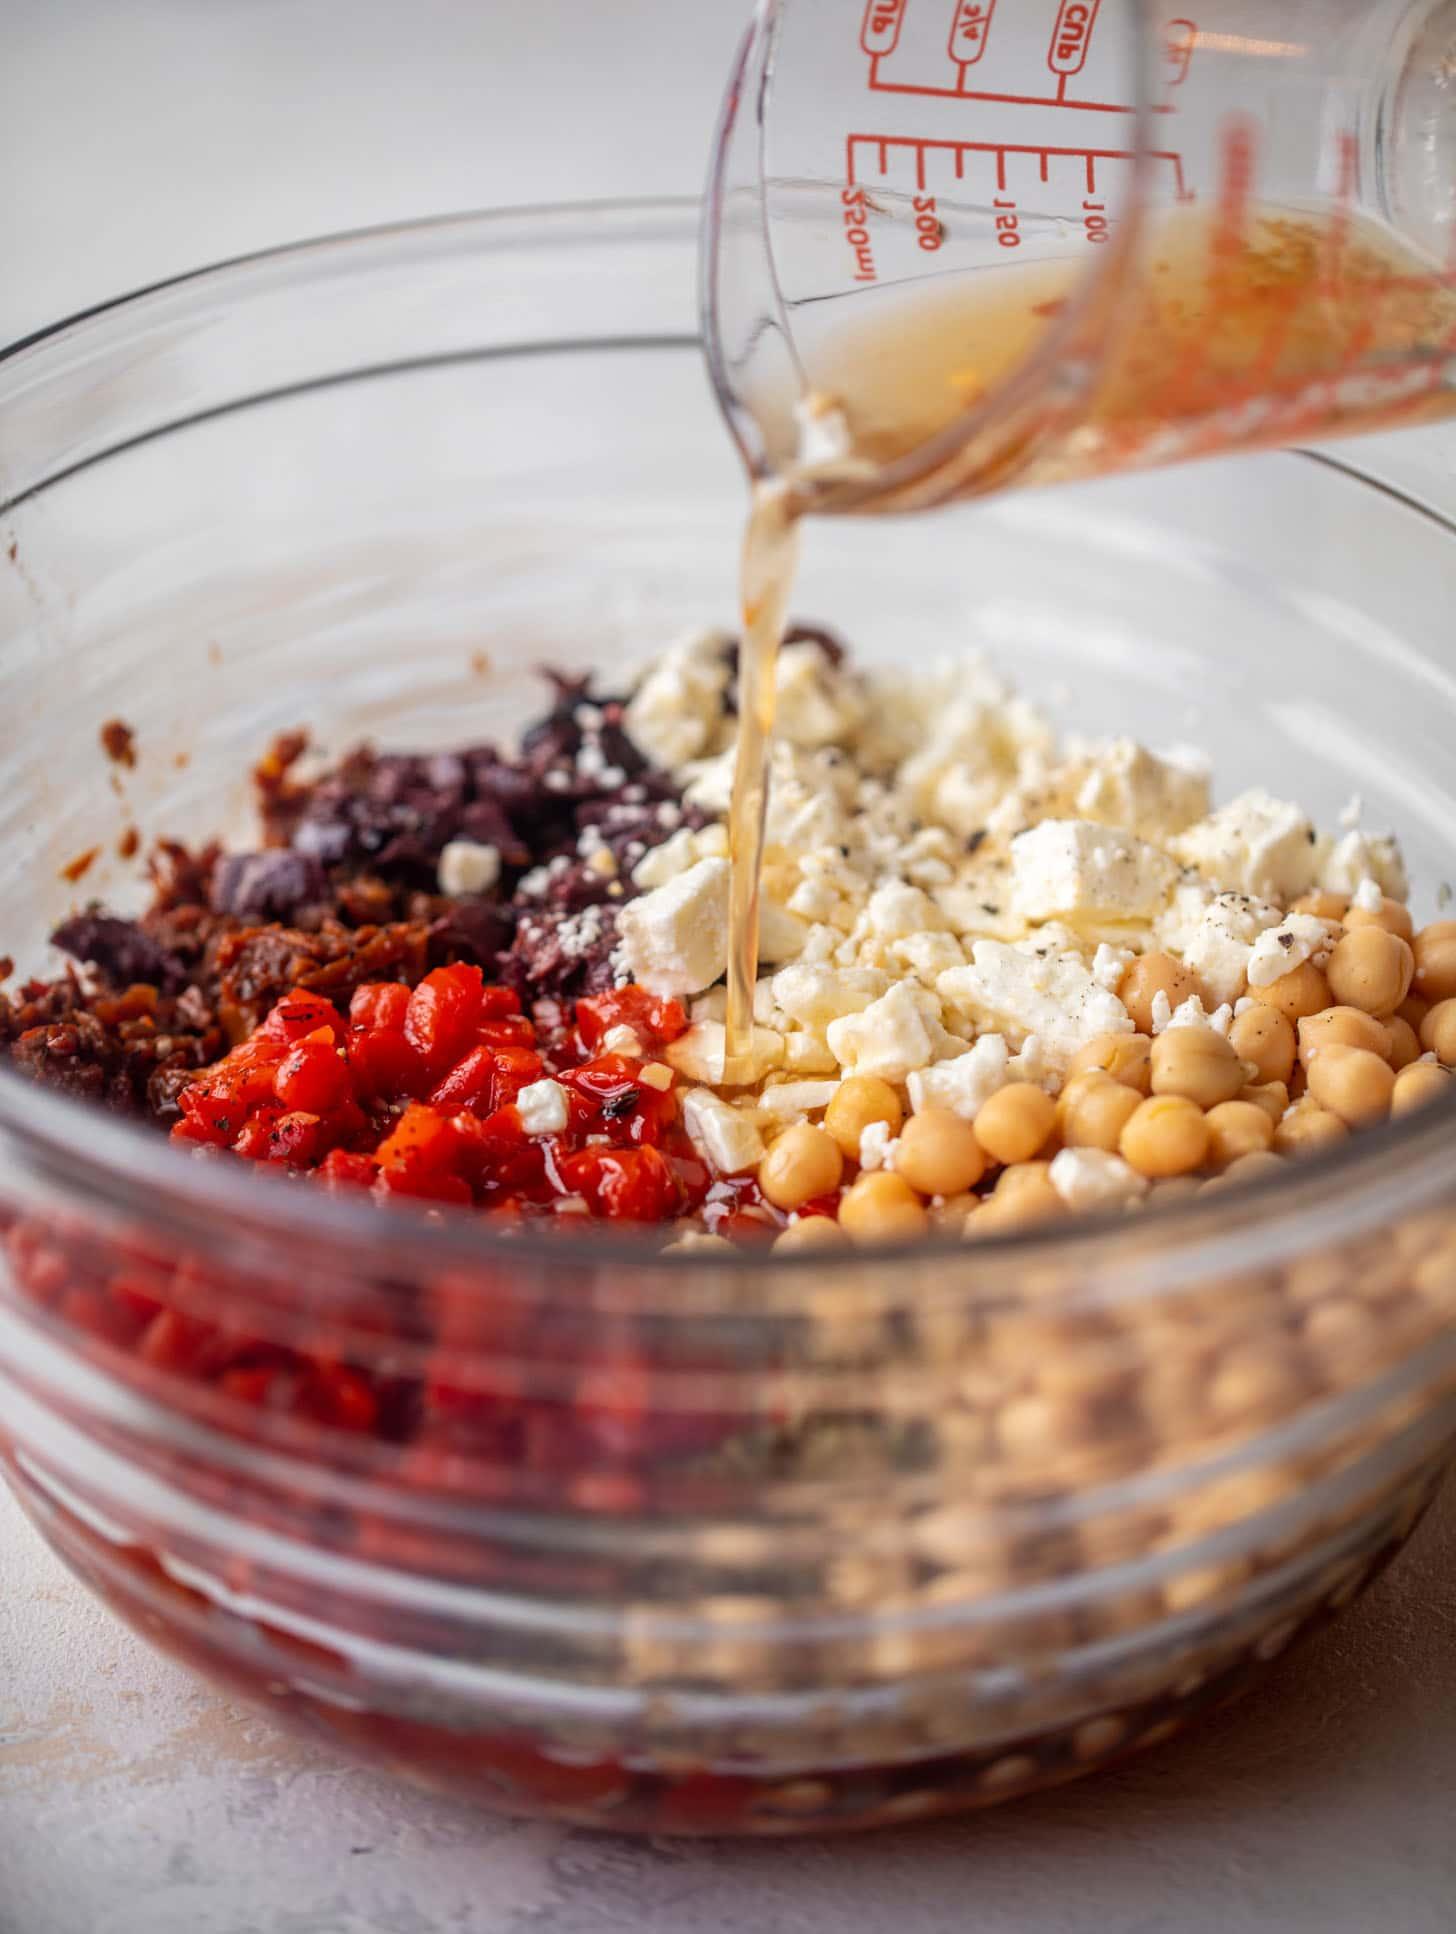 pouring vinaigrette on ingredients